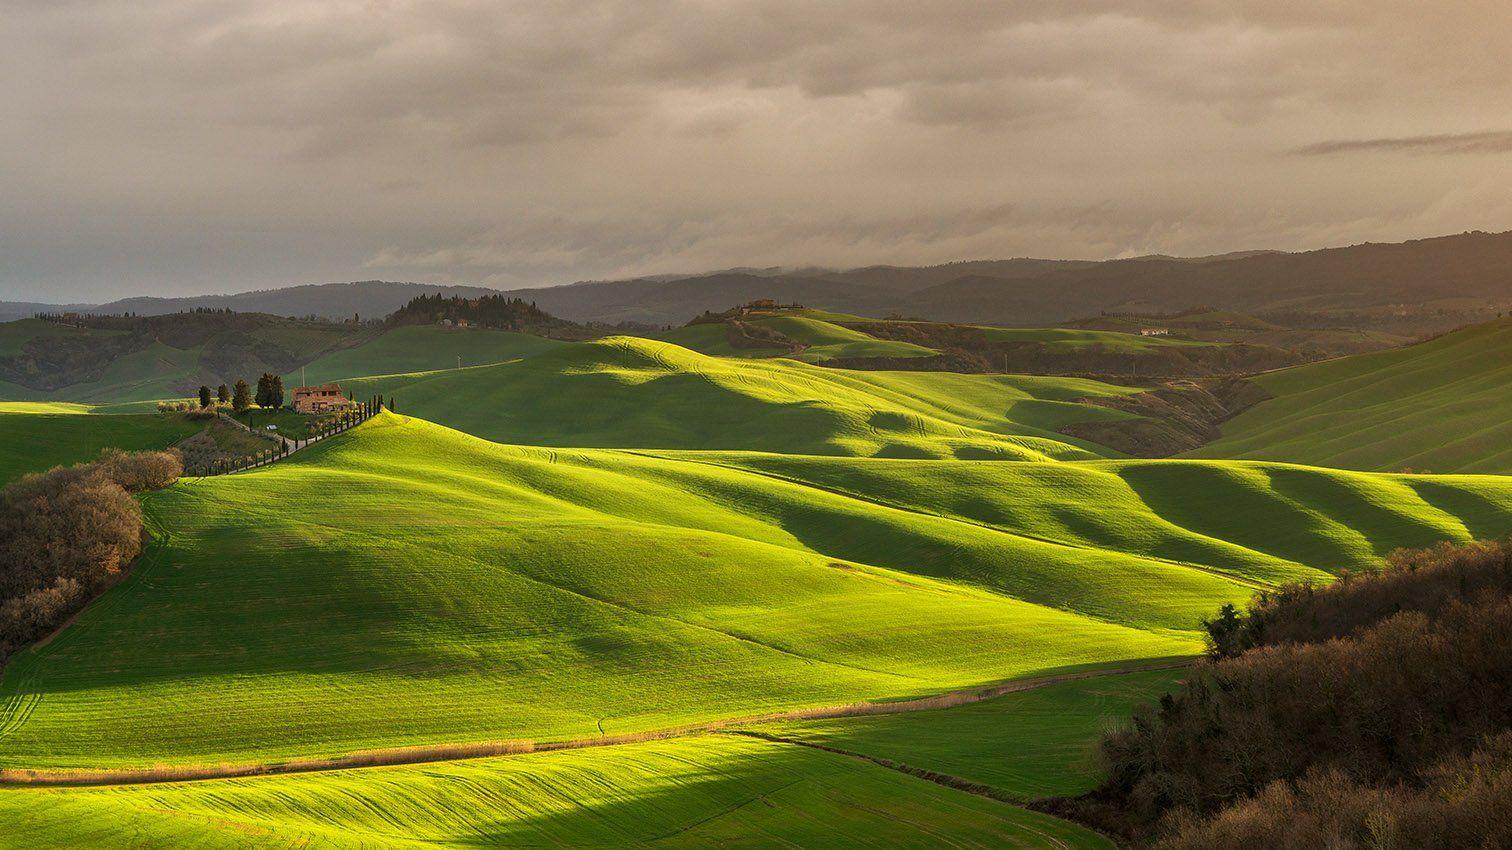 тоскана, италия, italy, tuscany, valdorcia, зеленые холмы тосканы, путешествие тоскана, весенняя тоскана, green hills, Татьяна Ефименко